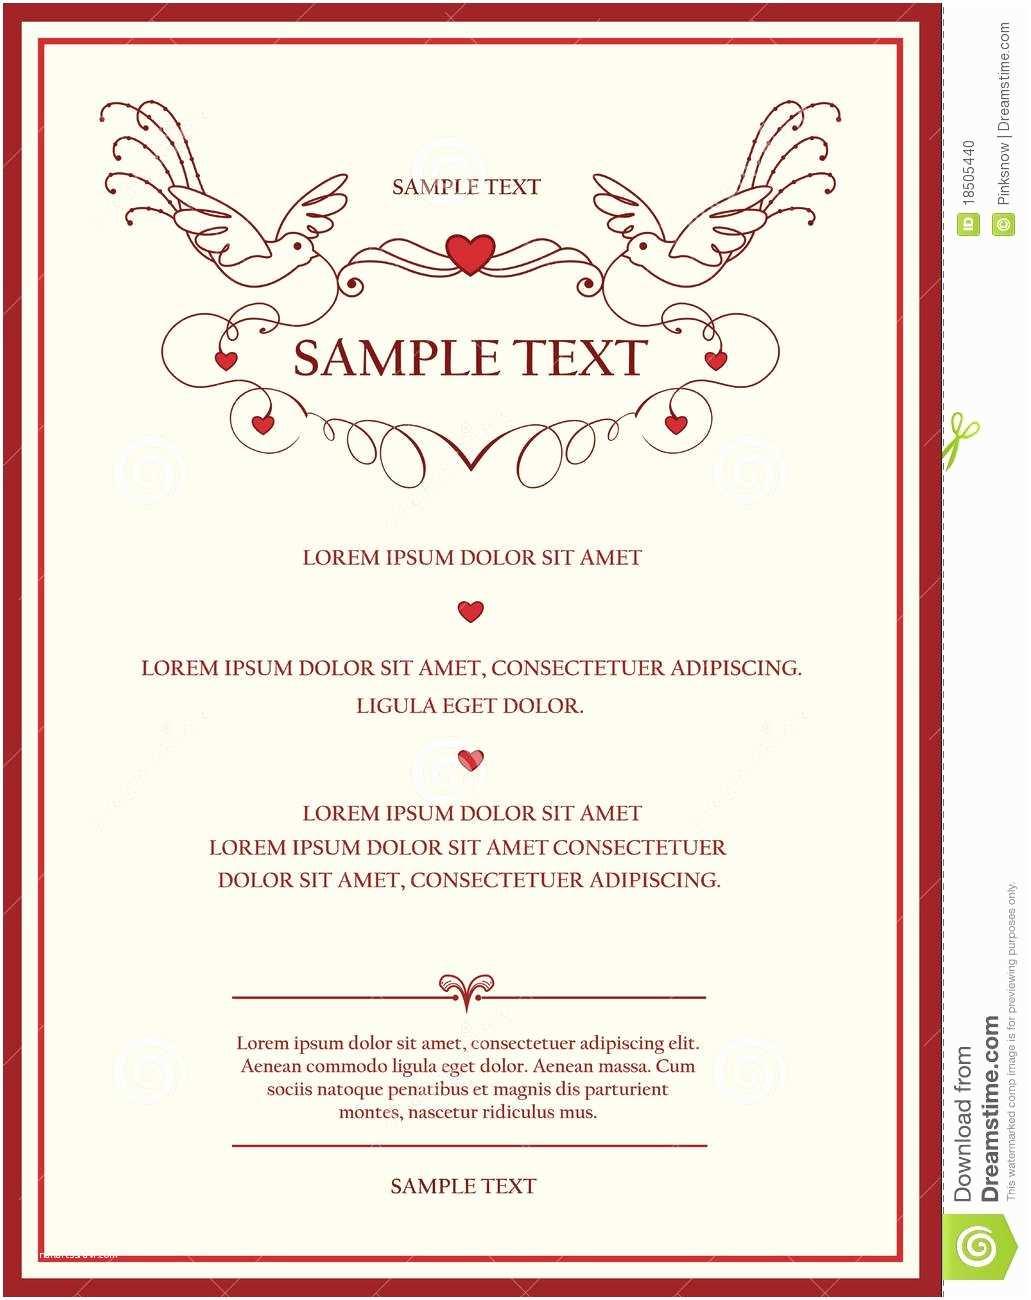 Indian Wedding Invitation Card Template Wedding Invitation Marriage Invitation Cards New